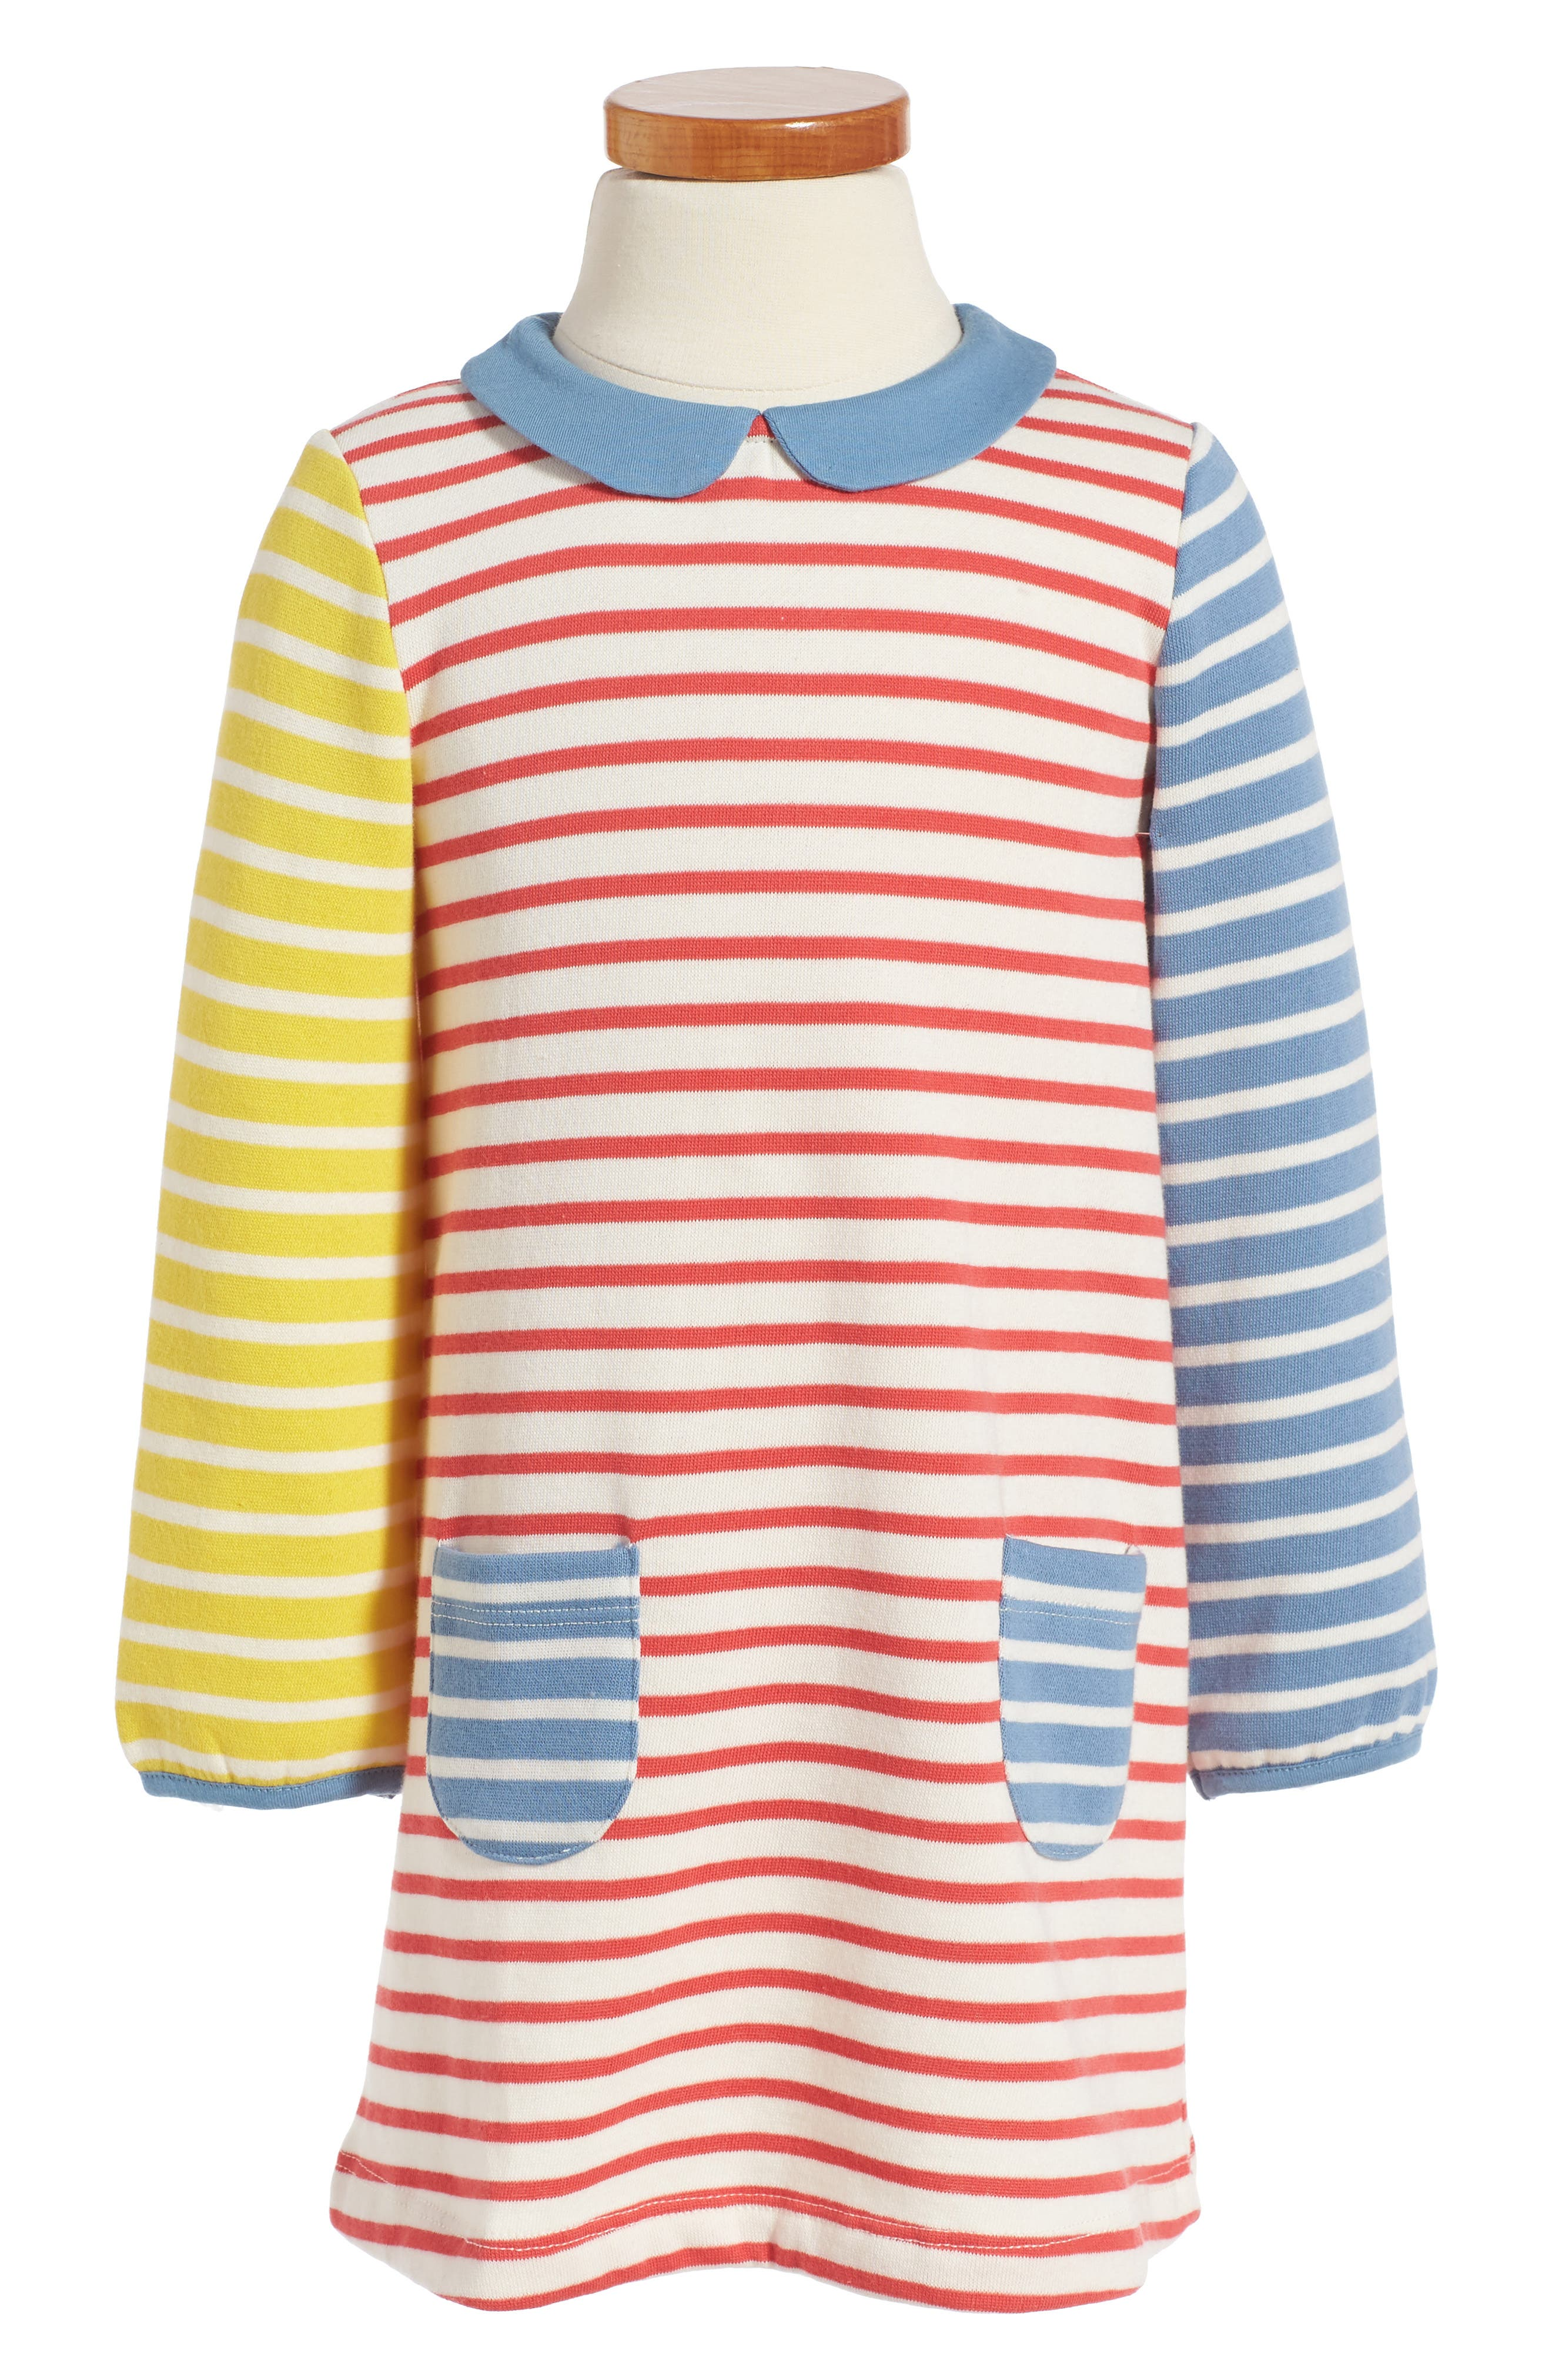 Main Image - Mini Boden Cosy Peter Pan Collar Sweatshirt Dress (Baby Girls & Toddler Girls)